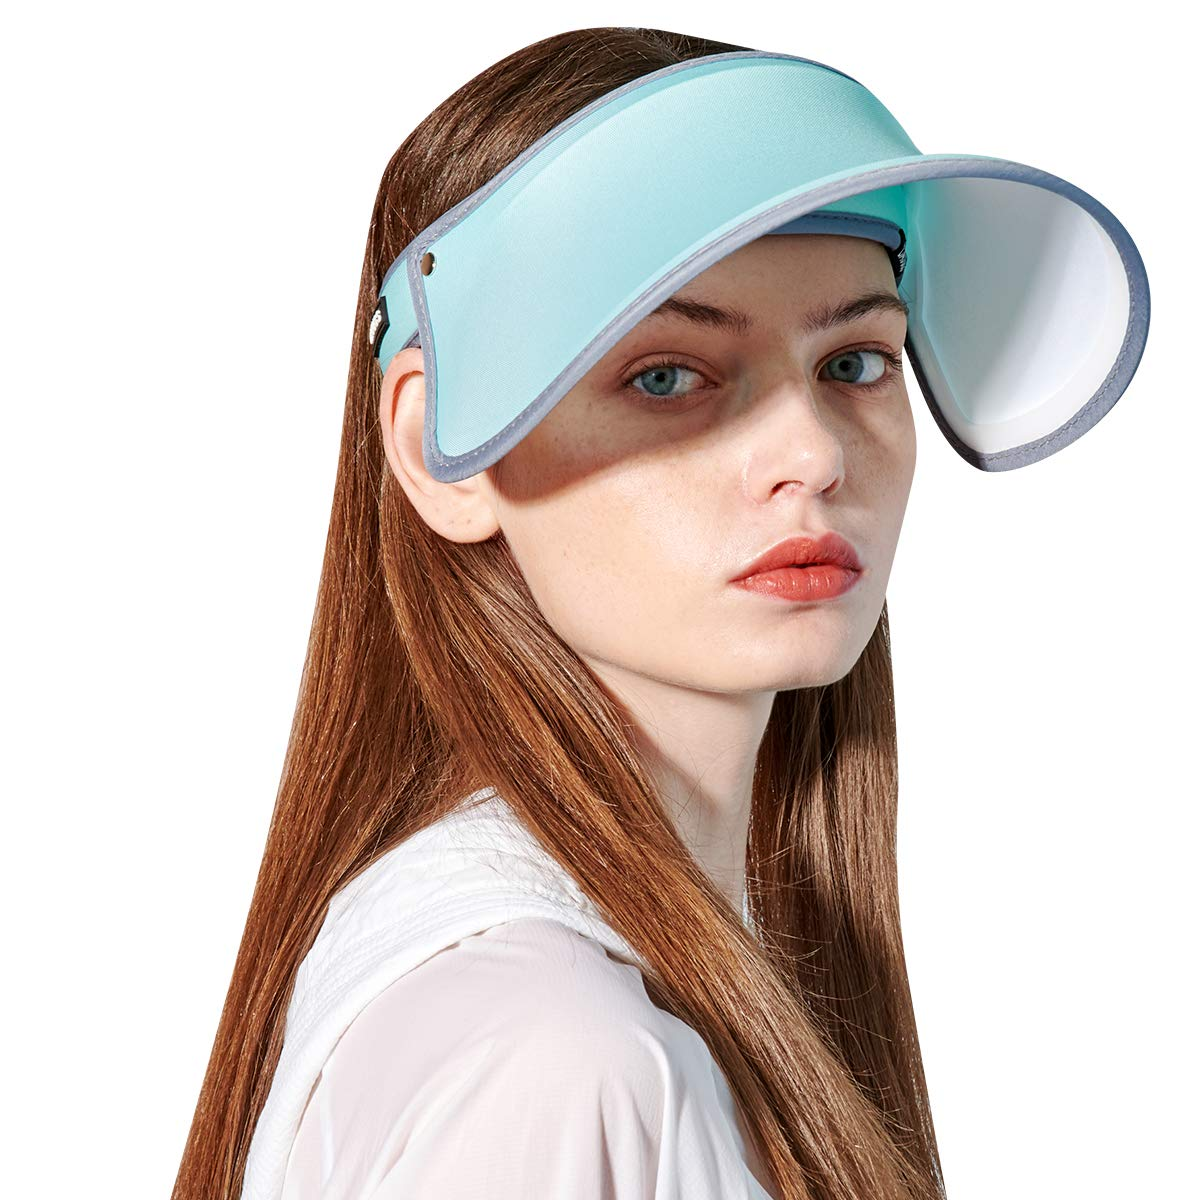 CACUSS Women's Visor UPF50+ Sun Cap Adjustable UV Protection Hat Outdoor Sports Cap(C0221-BLUE)